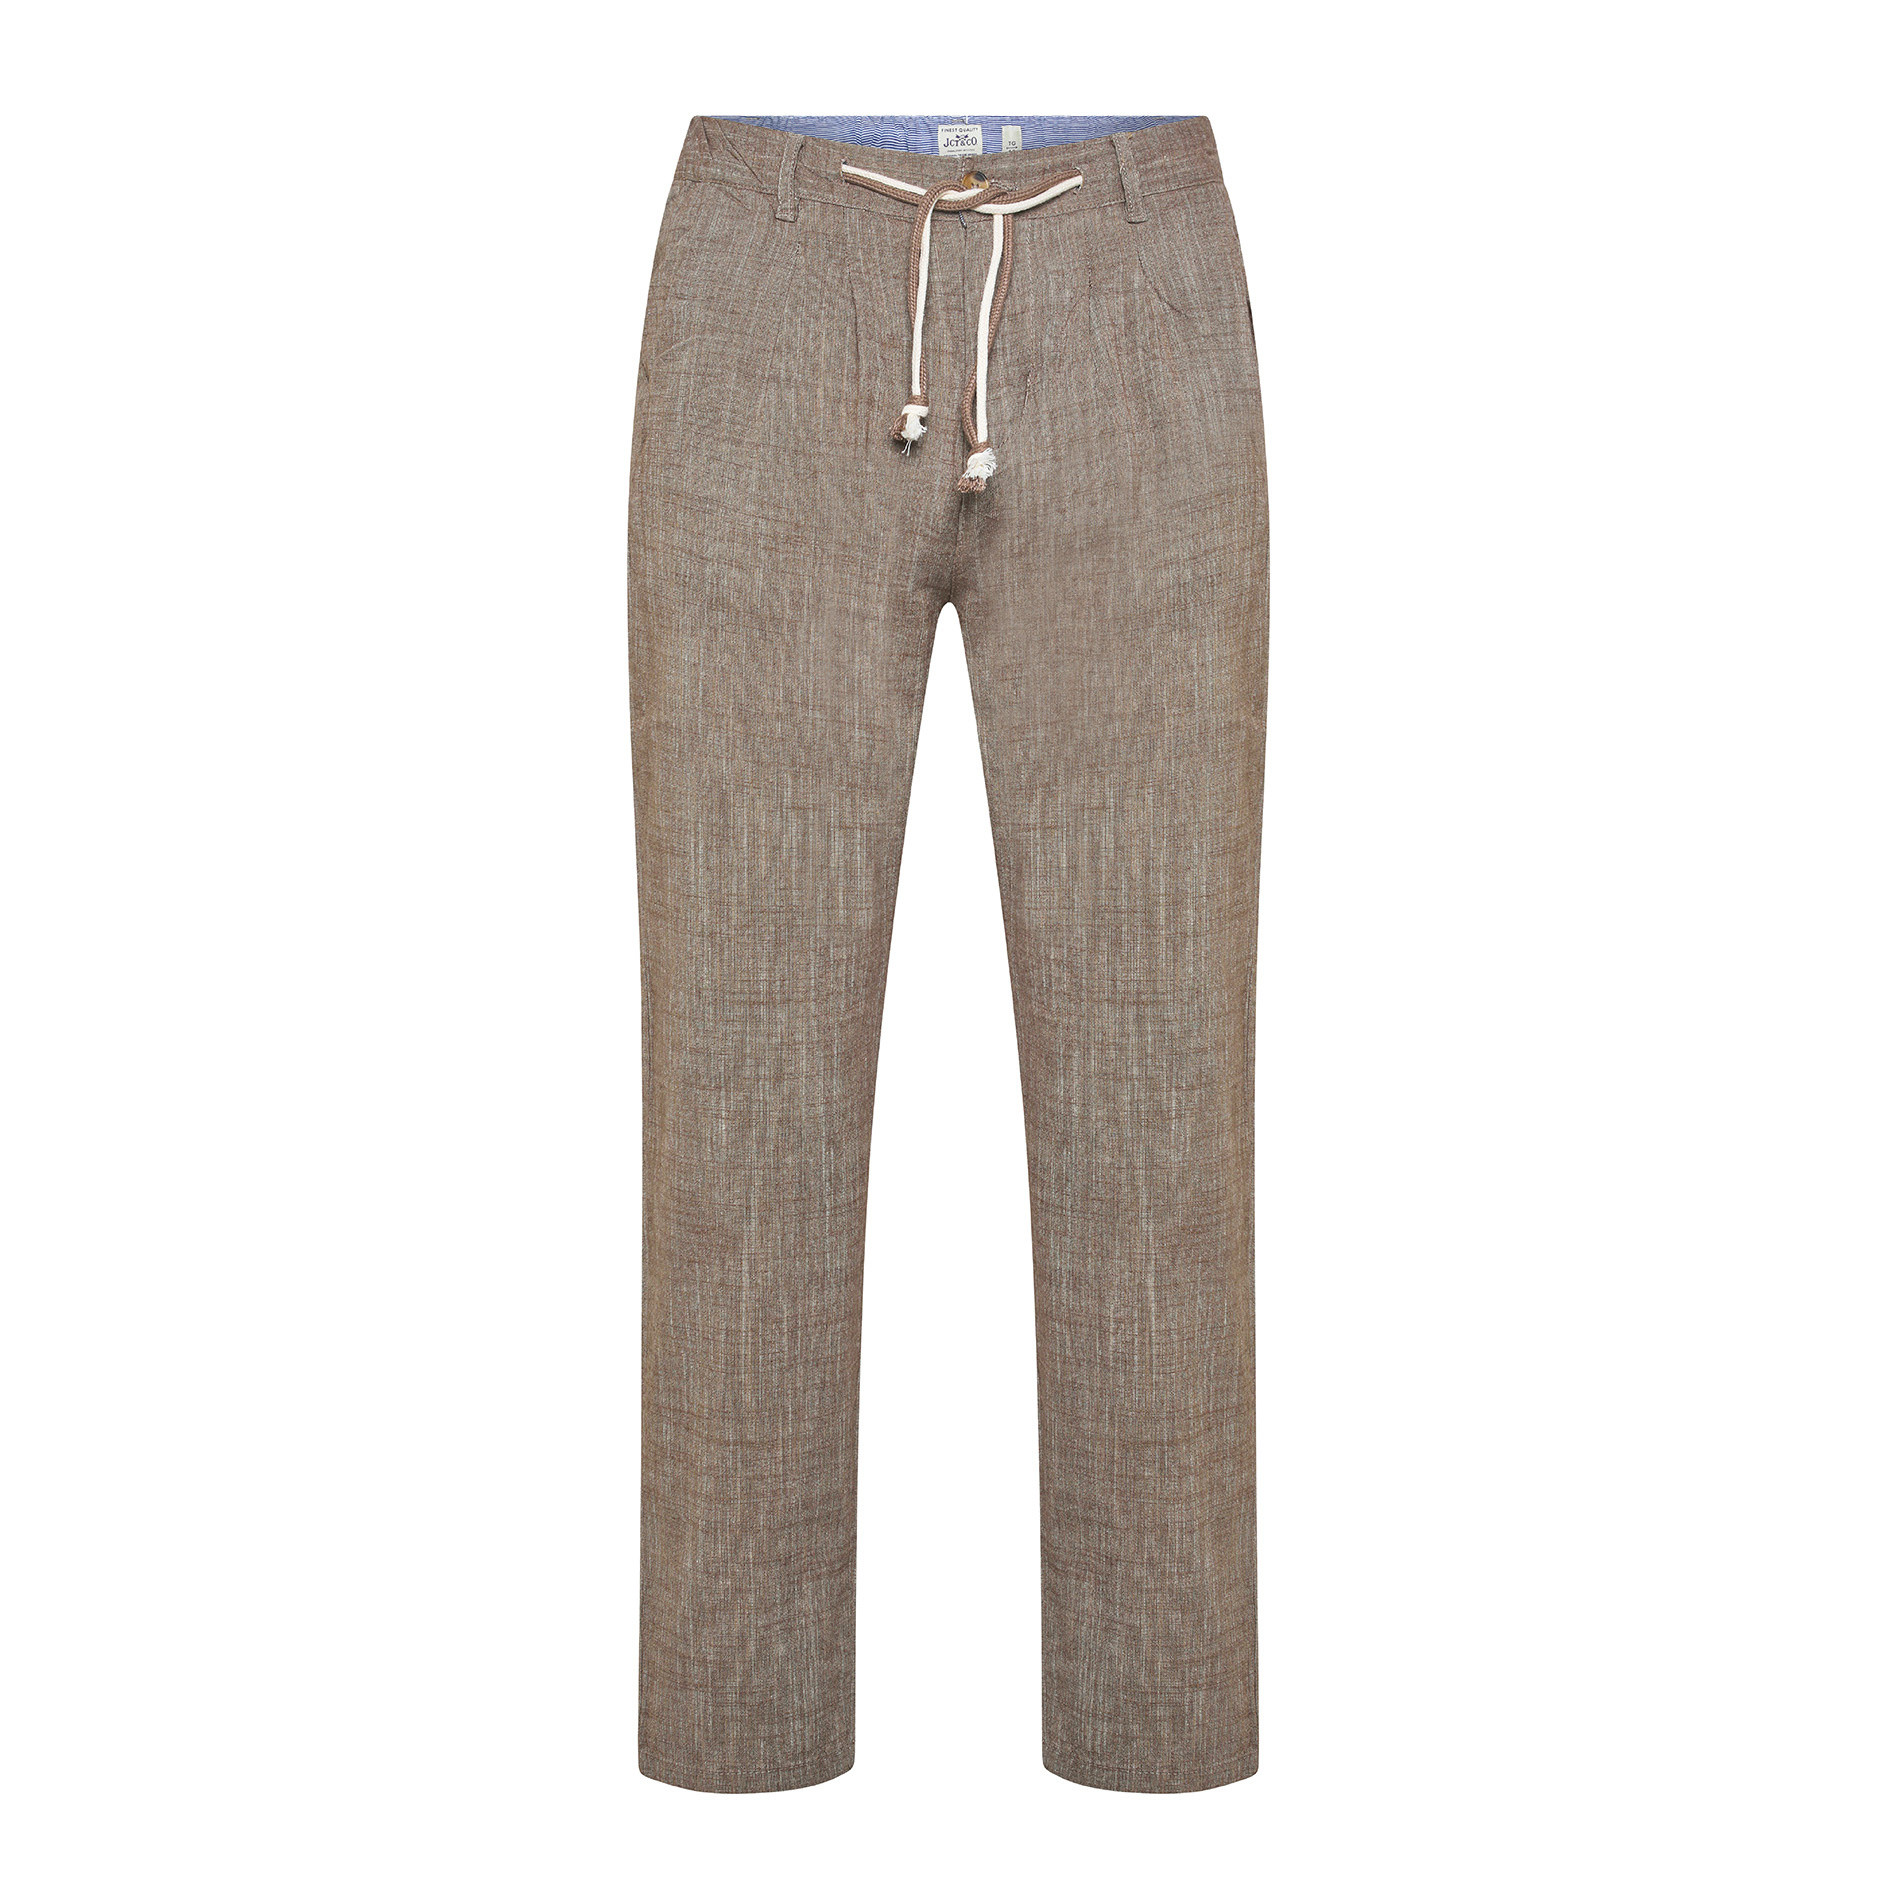 Pantalone puro cotone light JCT, Beige, large image number 0